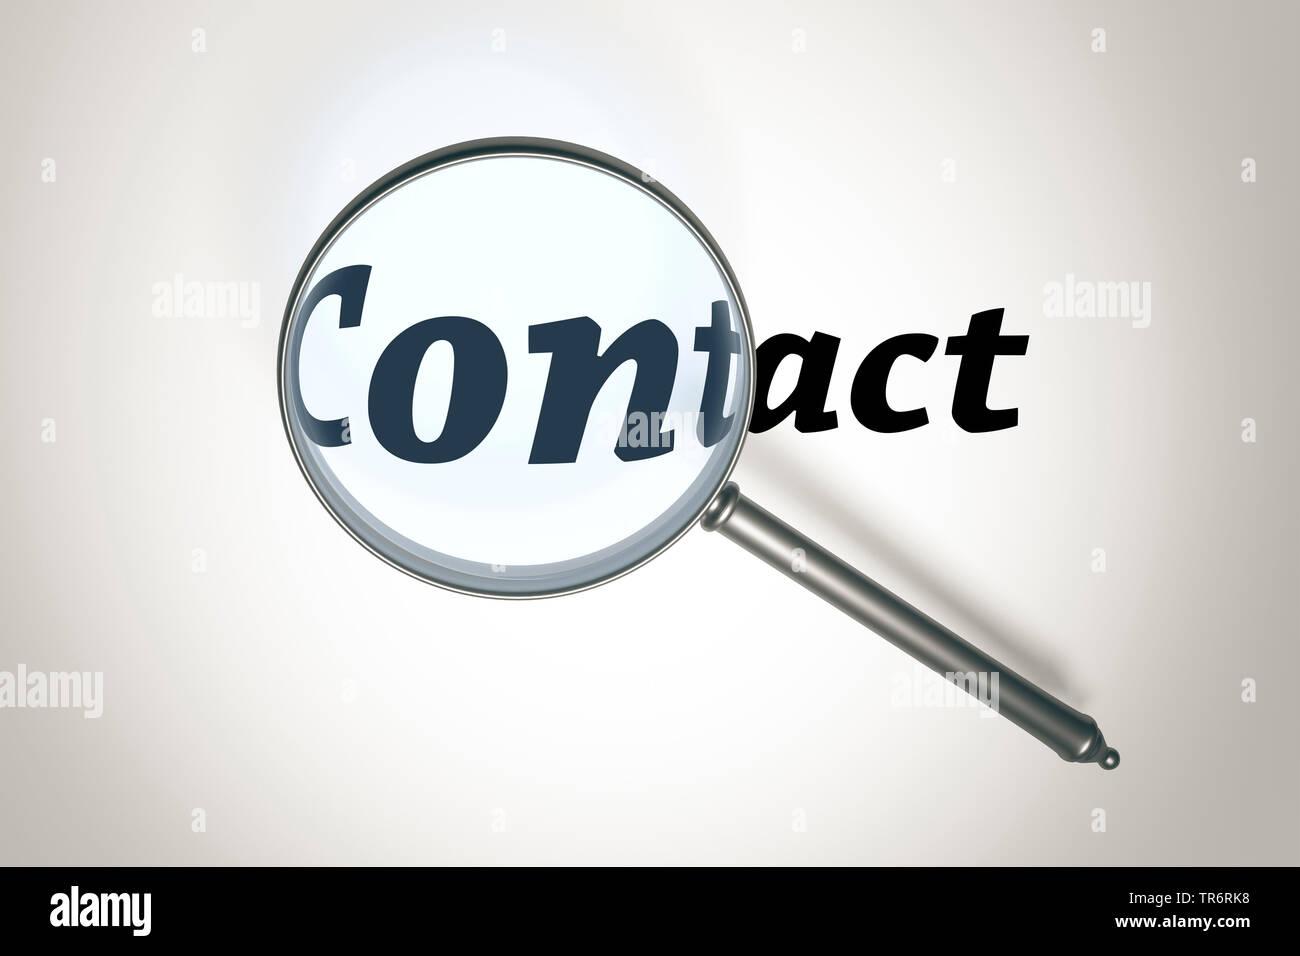 Lupe vergroessert das Wort contact, Kontakt | magnifying glass with the word contact | BLWS489720.jpg [ (c) blickwinkel/McPHOTO/M. Gann Tel. +49 (0)23 - Stock Image